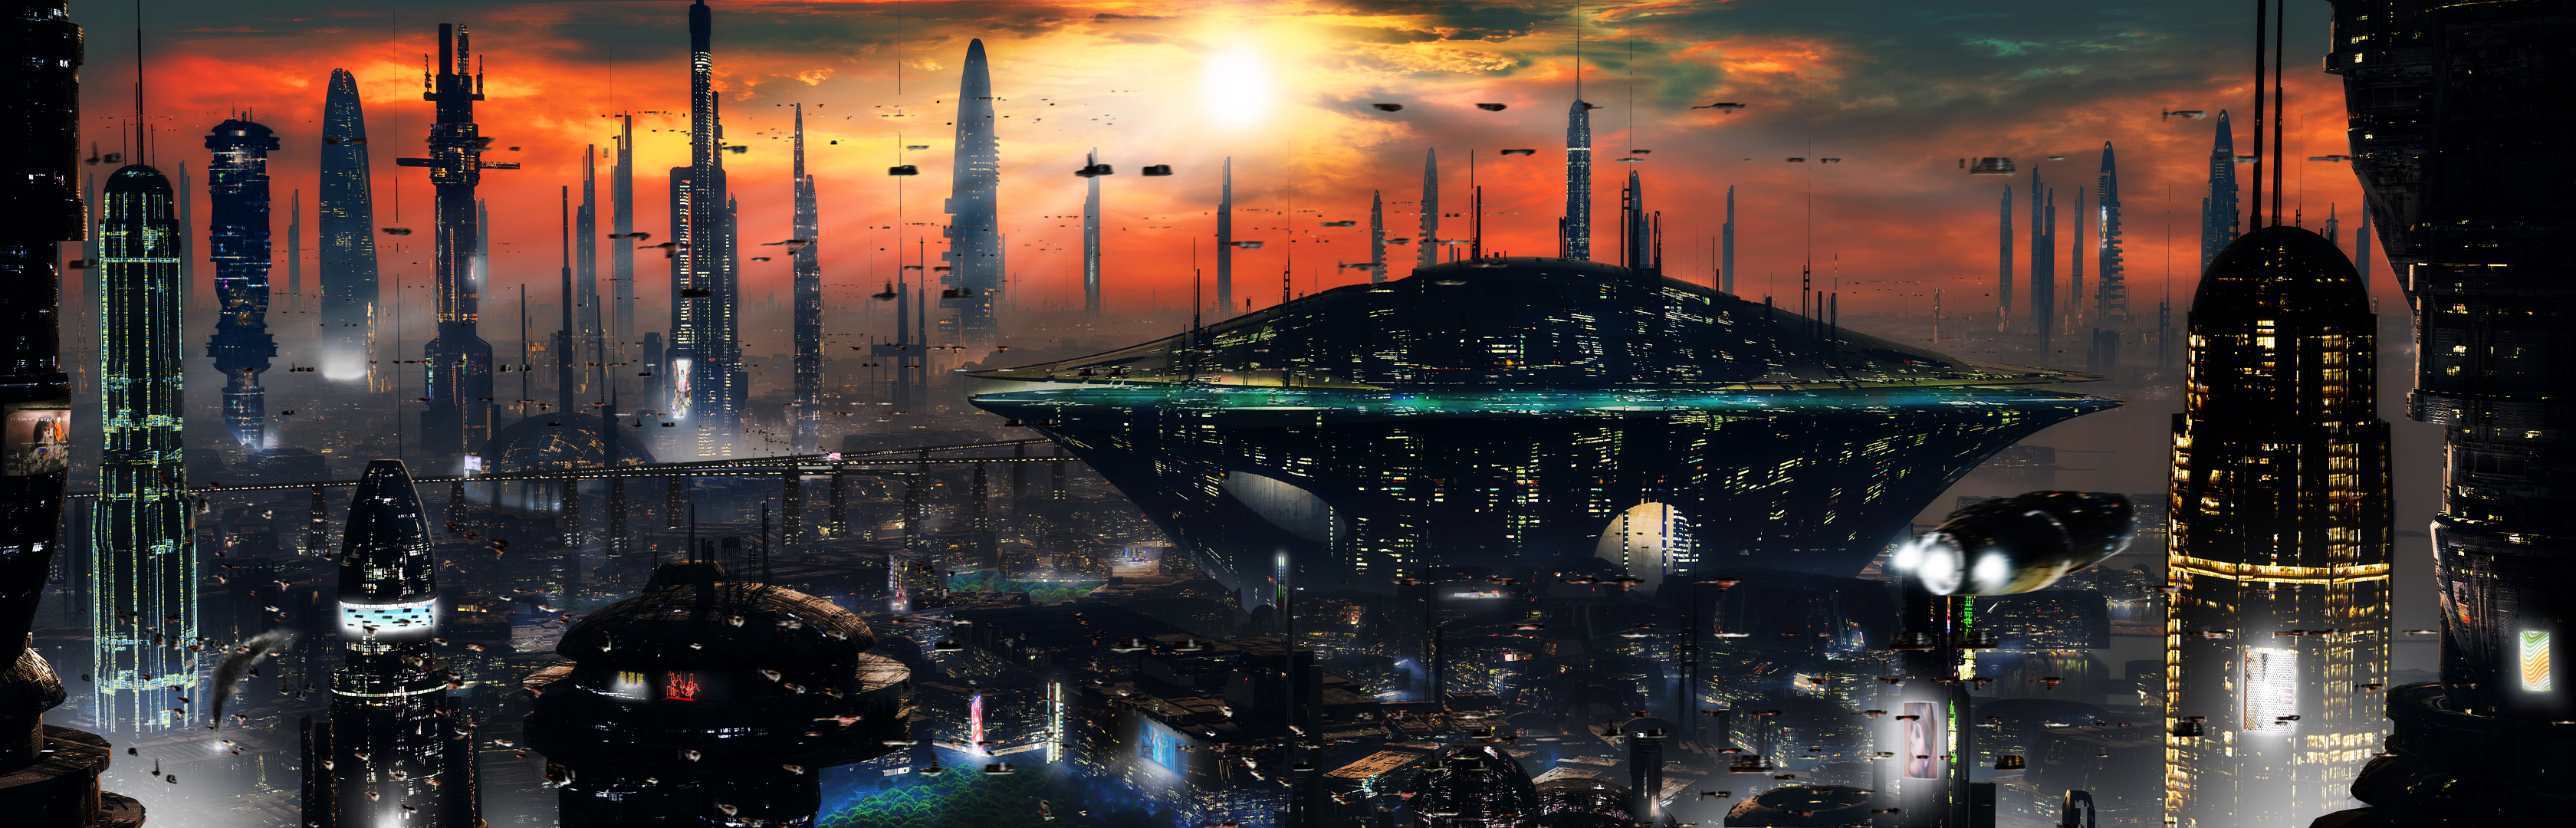 Futuristic City 2 by rich35211